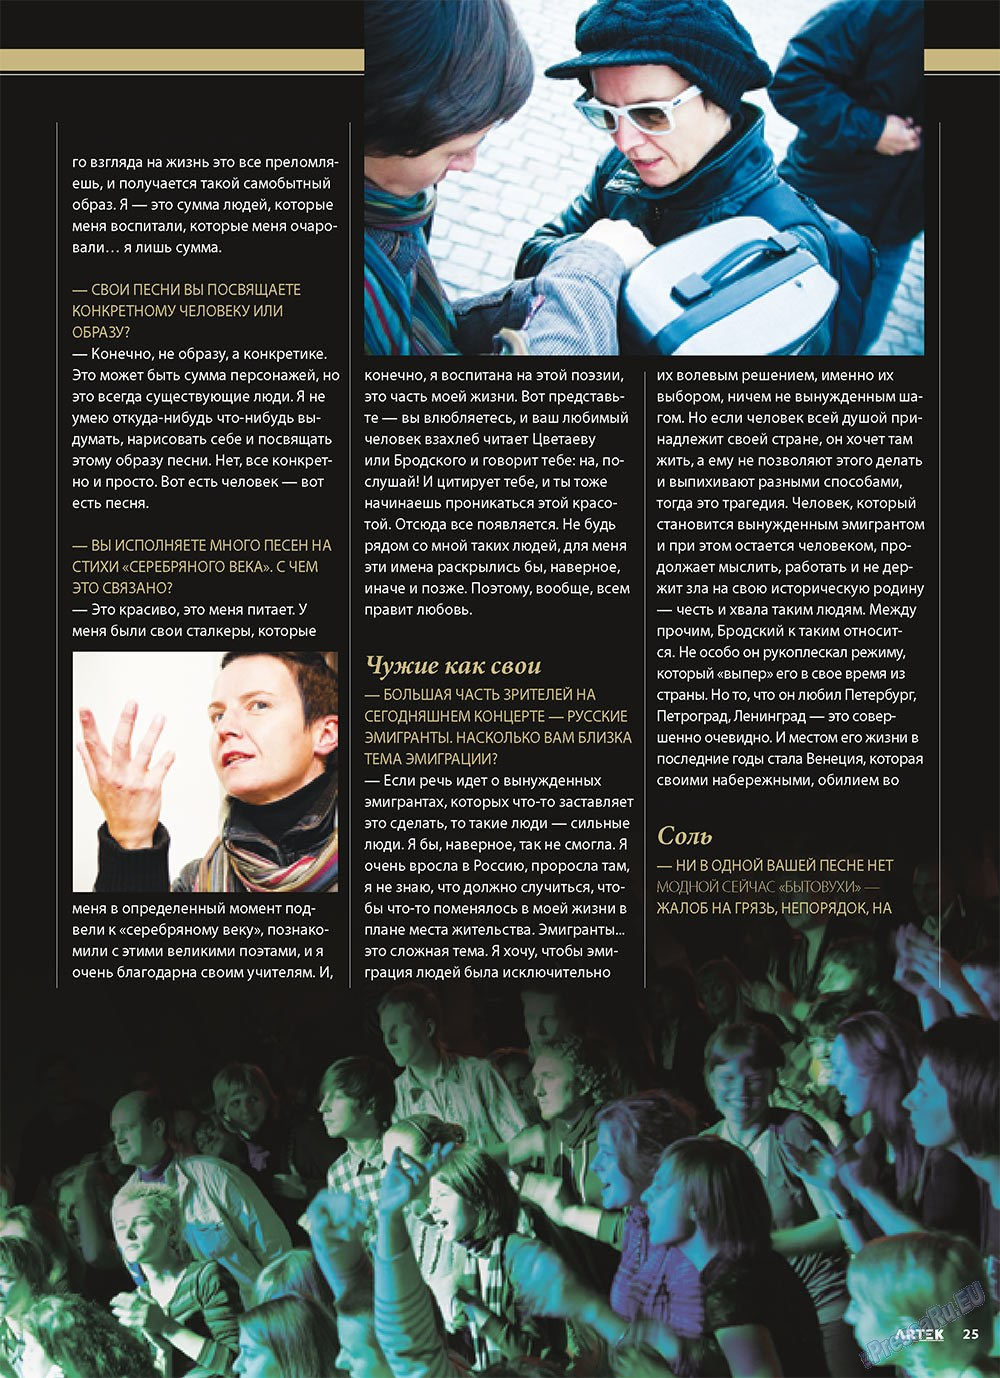 Артек (журнал). 2010 год, номер 5, стр. 27